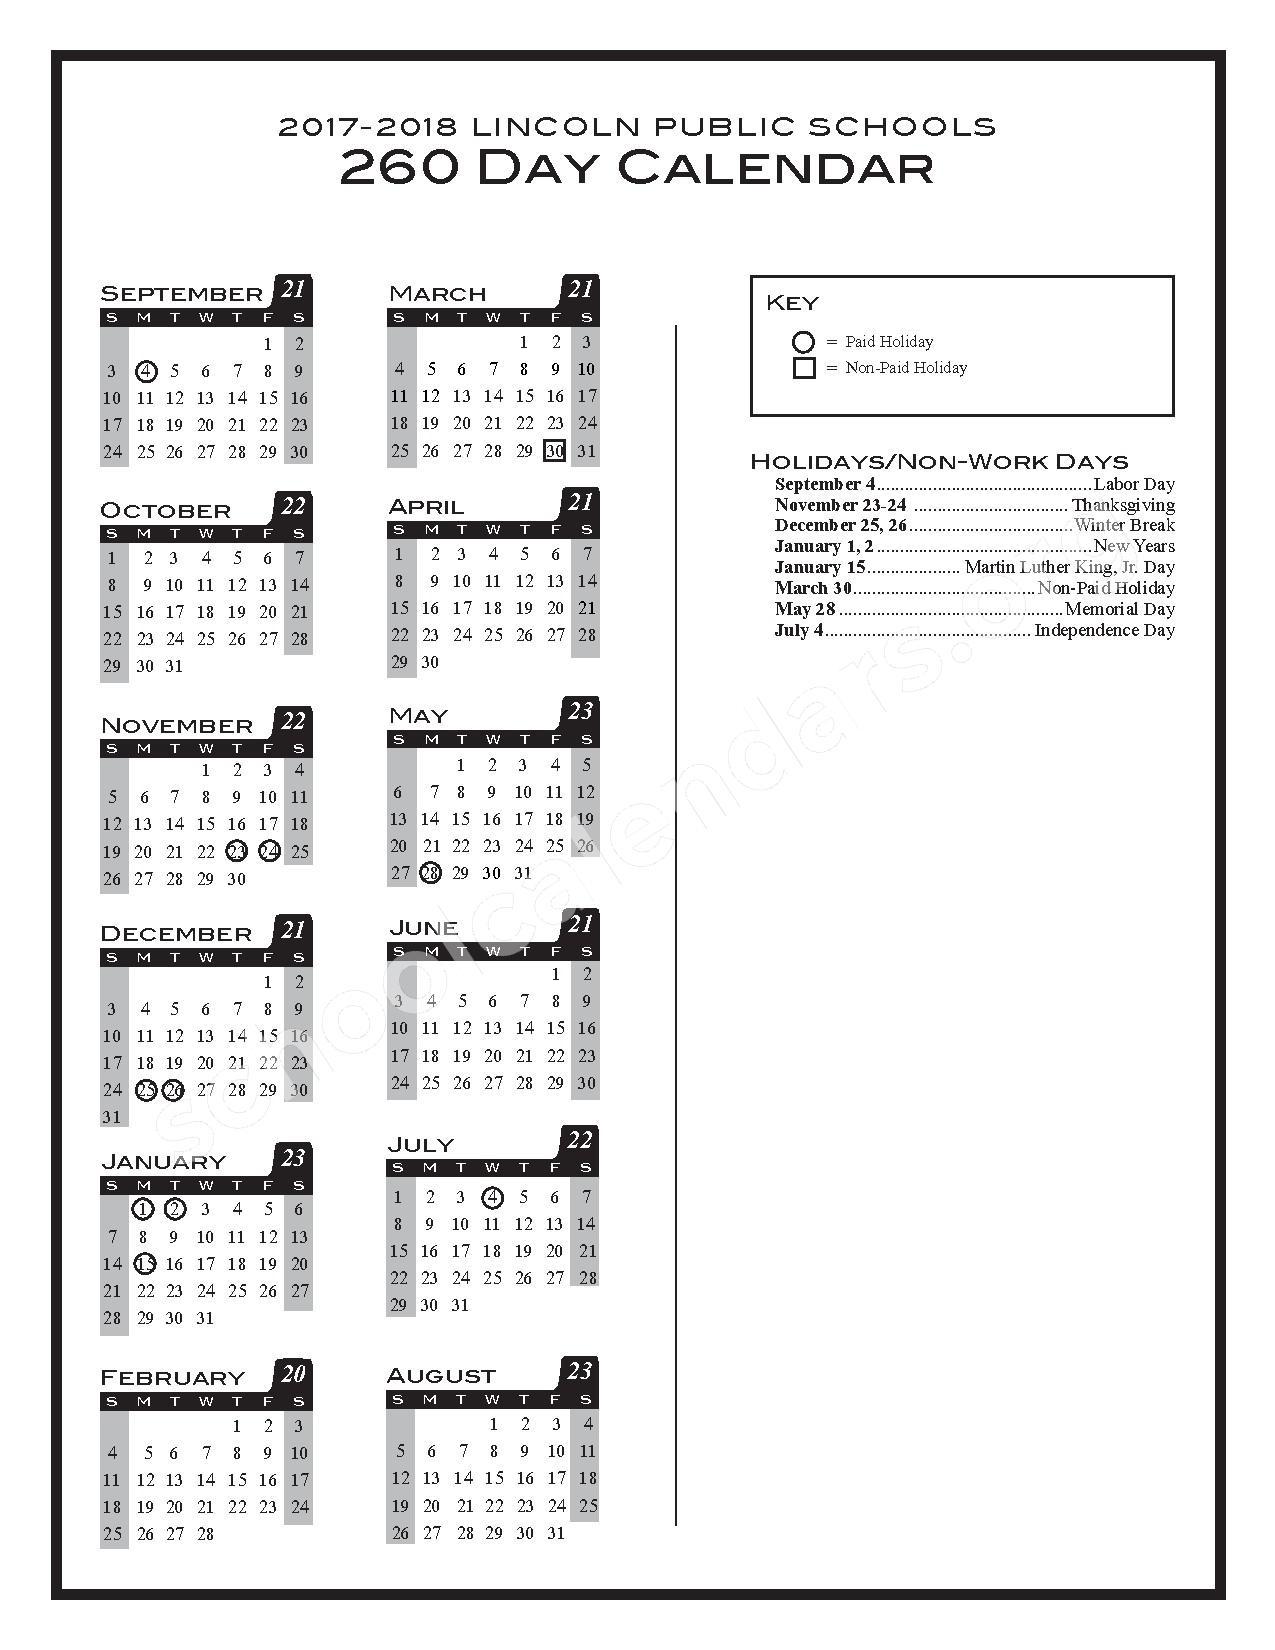 2017 - 2018 260-day Calendar – Lincoln Public Schools – page 1